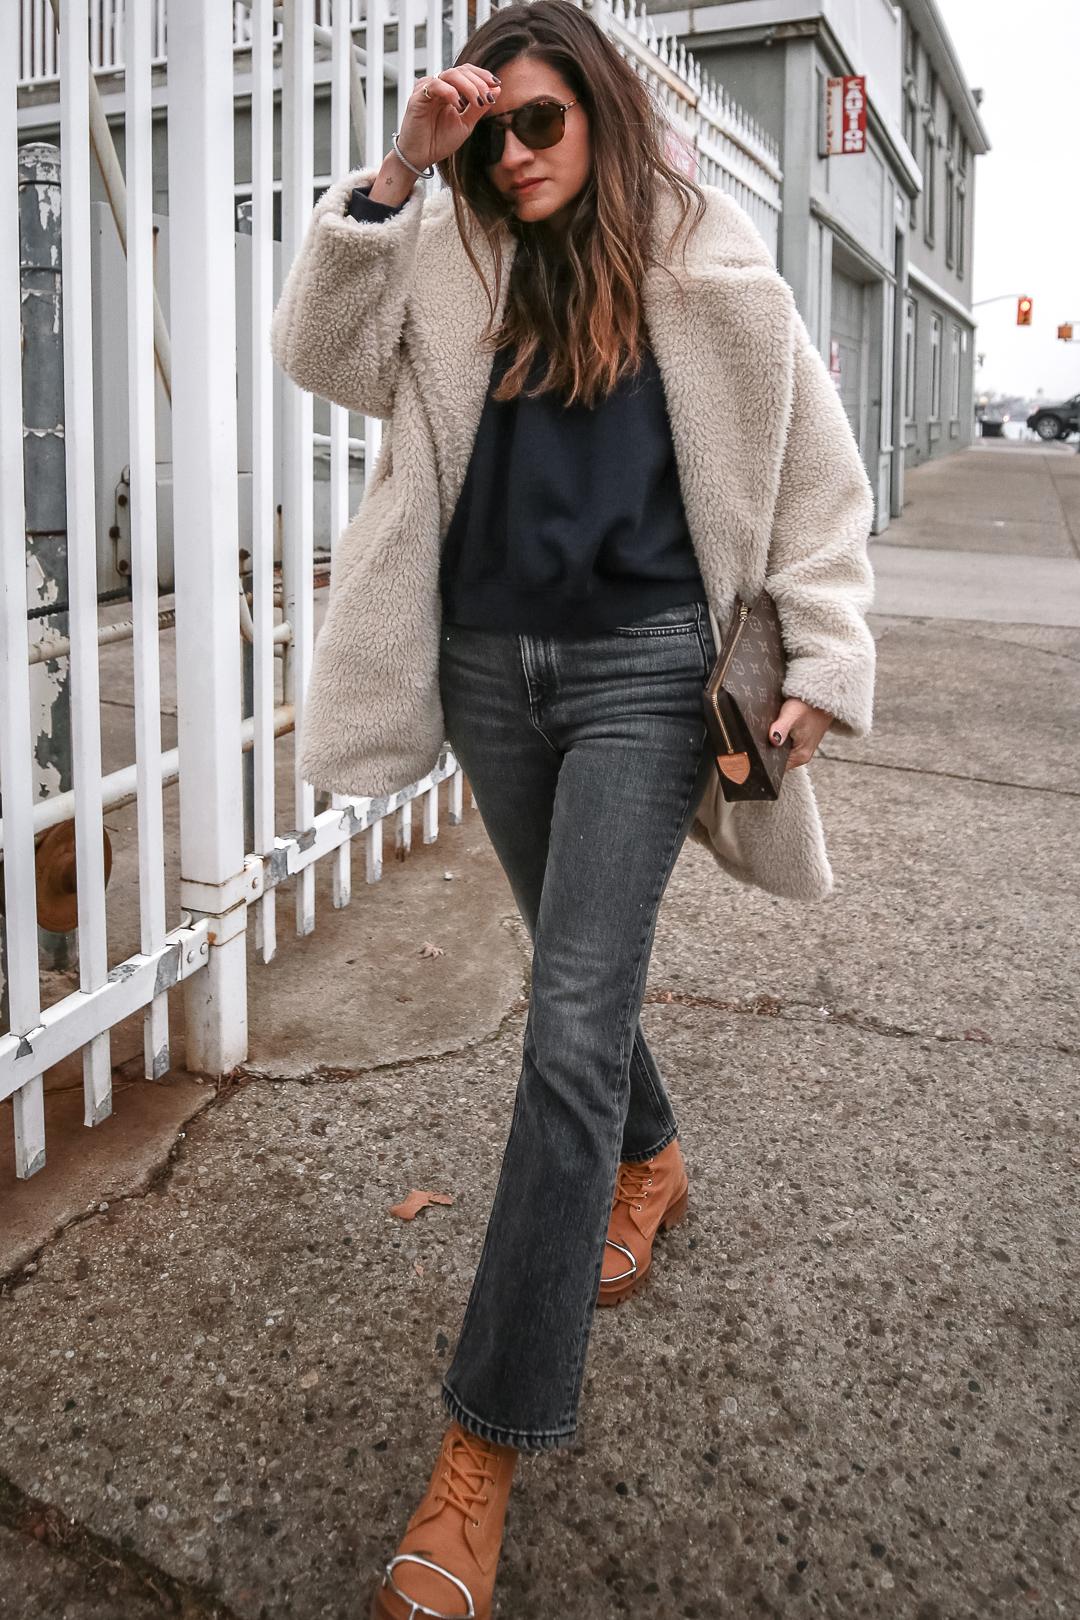 Nathalie Martin - Louis Vuitton Toiletry Pouch clutch 19, navy sweatshirt, Topshop teddy bear coat, Rag & Bone Hana cropped flared jeans, Alexander Wang Lyndon combat boots, casual street style, woahstyle.com_4831.jpg